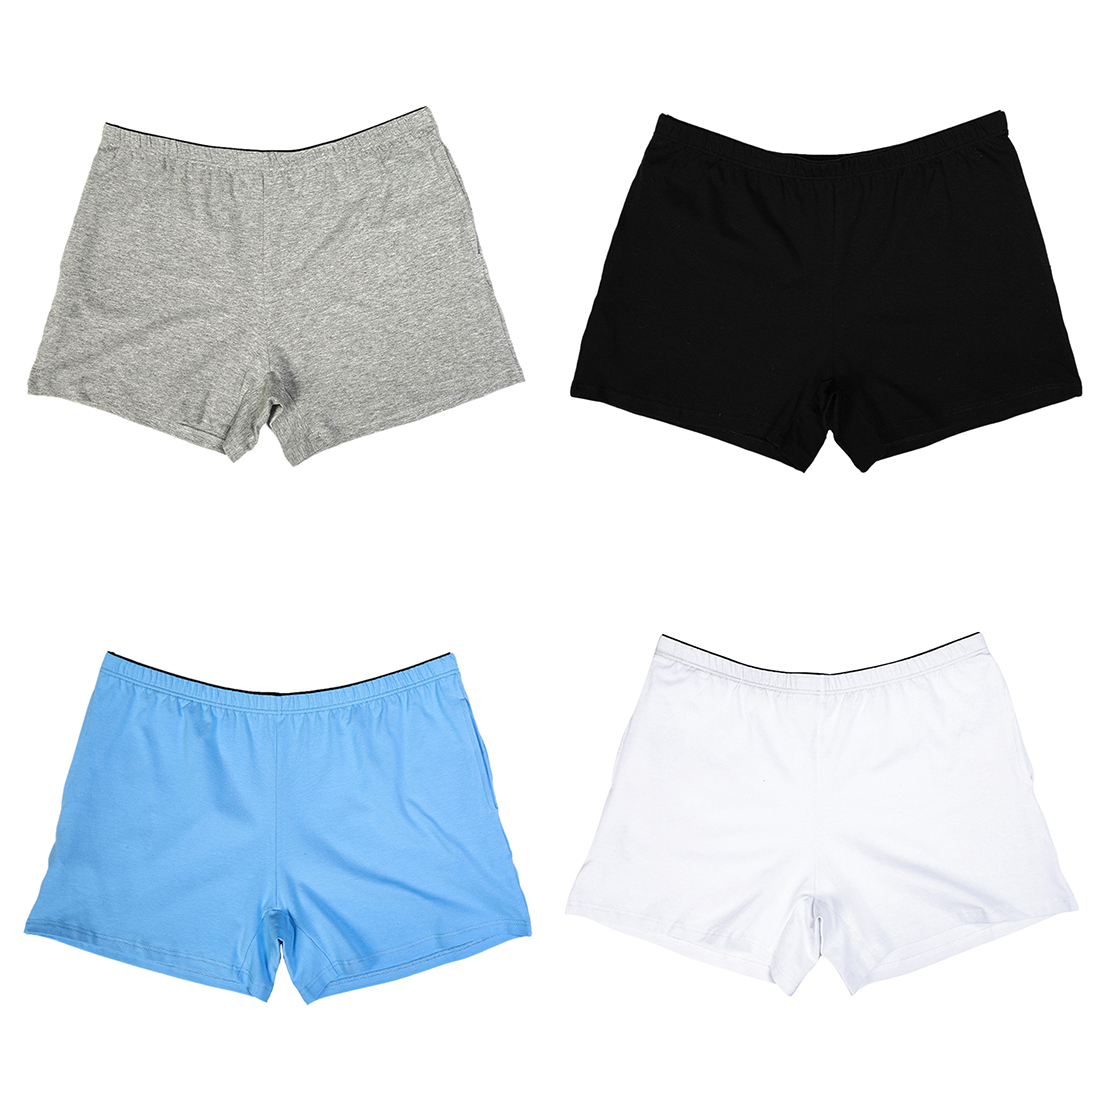 Mens Boxer Briefs Underwear Cute Penguin No Ride Up Cotton Stretch Short